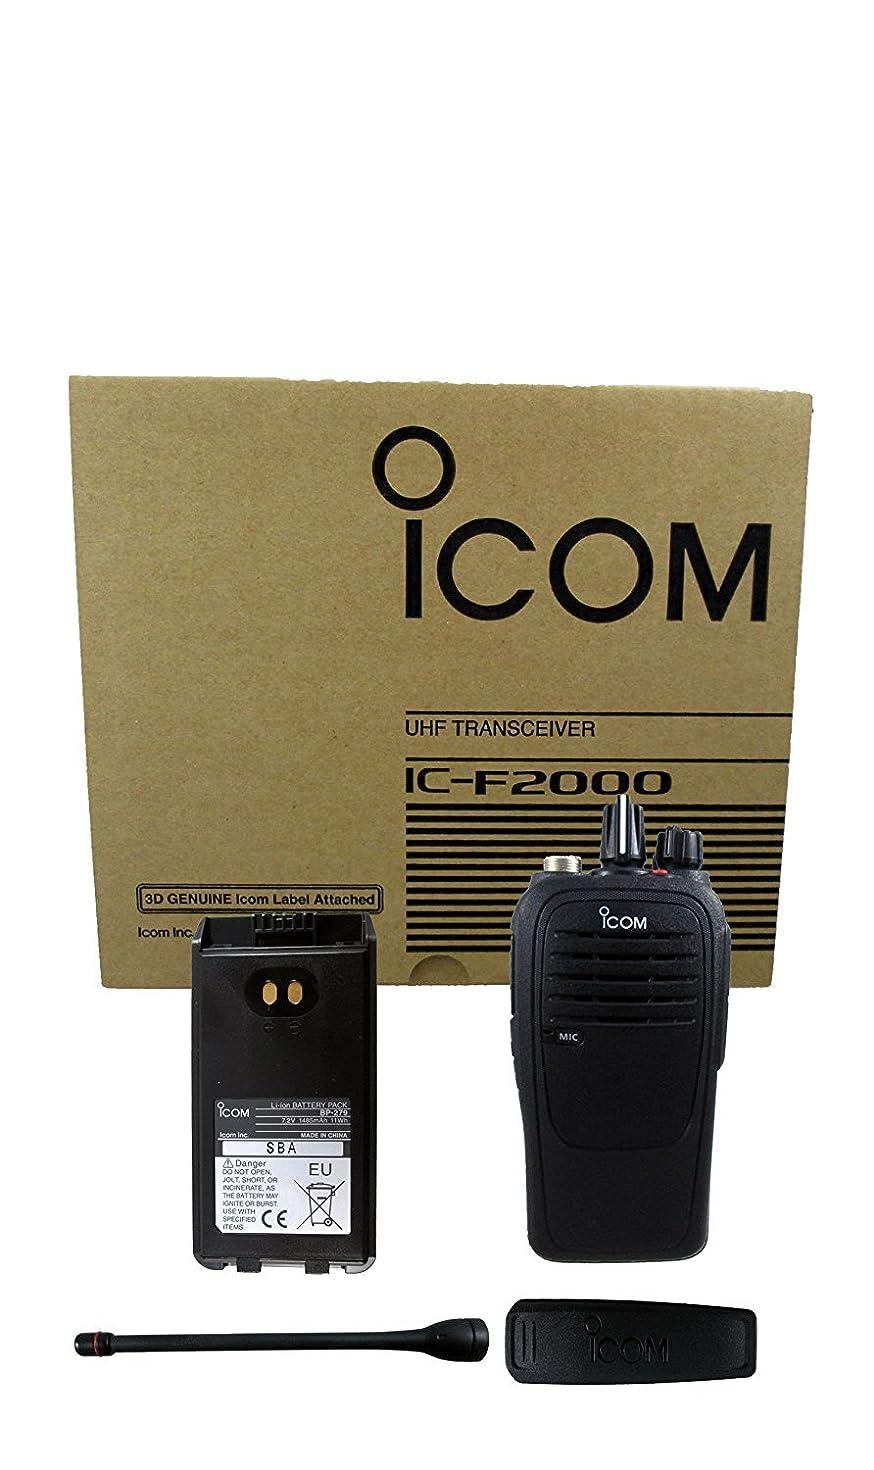 Icom IC-F2000 01 4 watt 16 channel UHF 400-470mhz two way radio